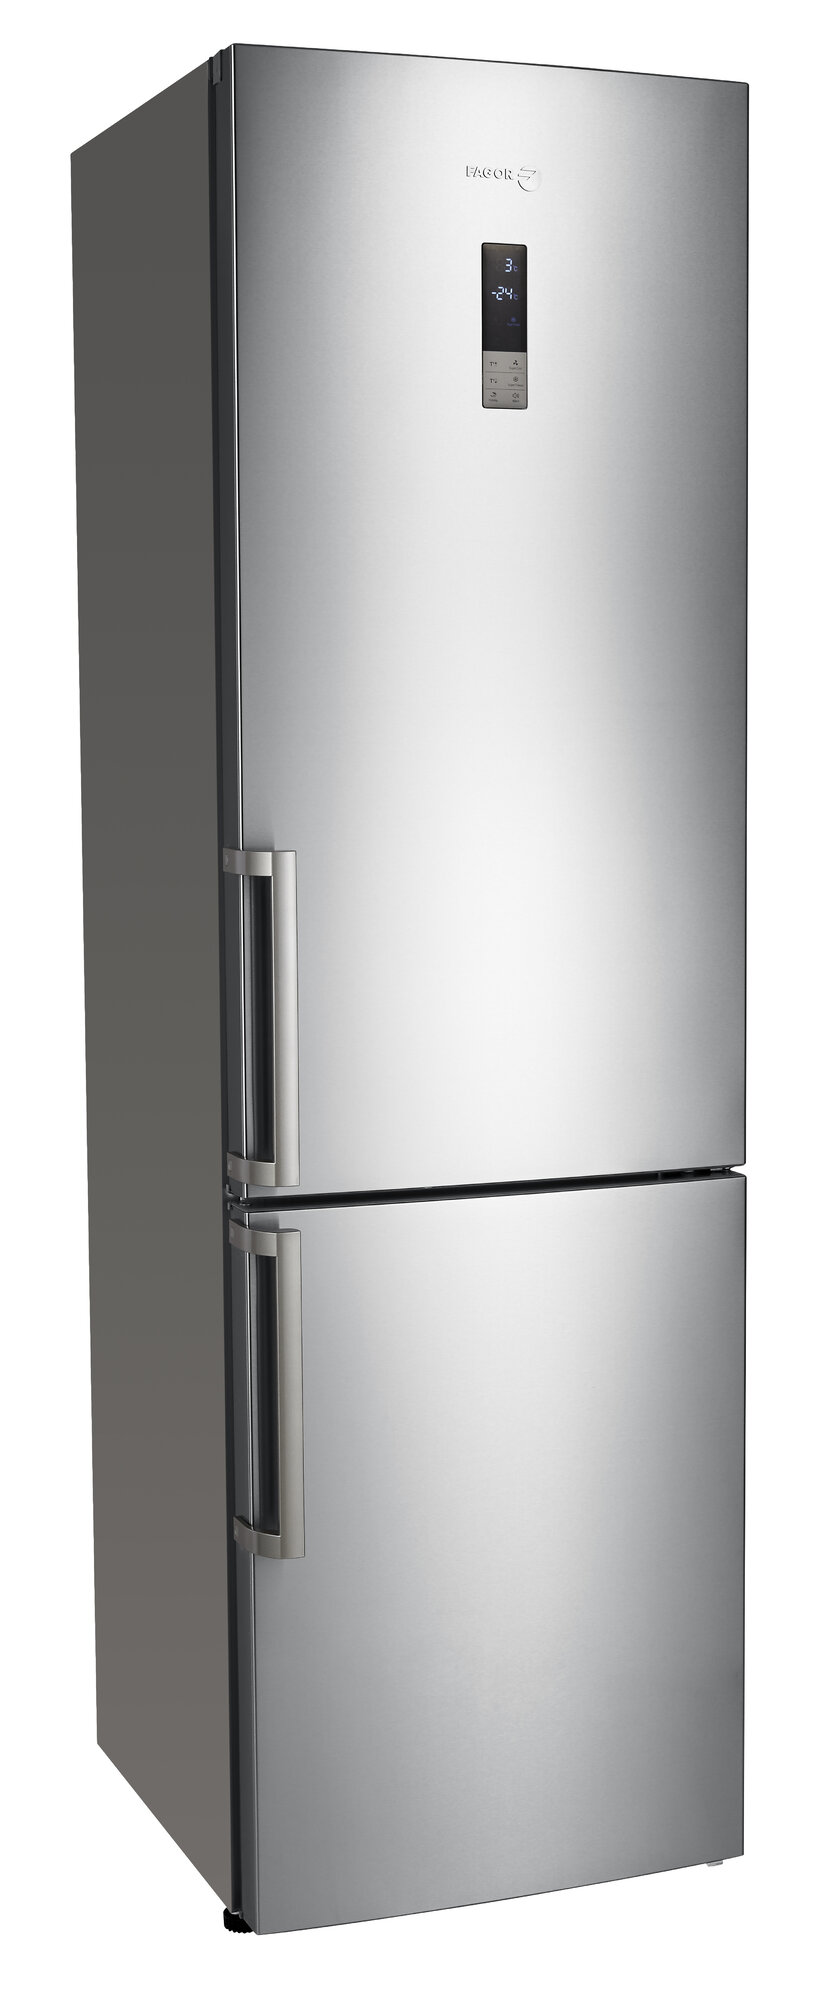 fagor 13 3 cu ft counter depth bottom freezer refrigerator. Black Bedroom Furniture Sets. Home Design Ideas